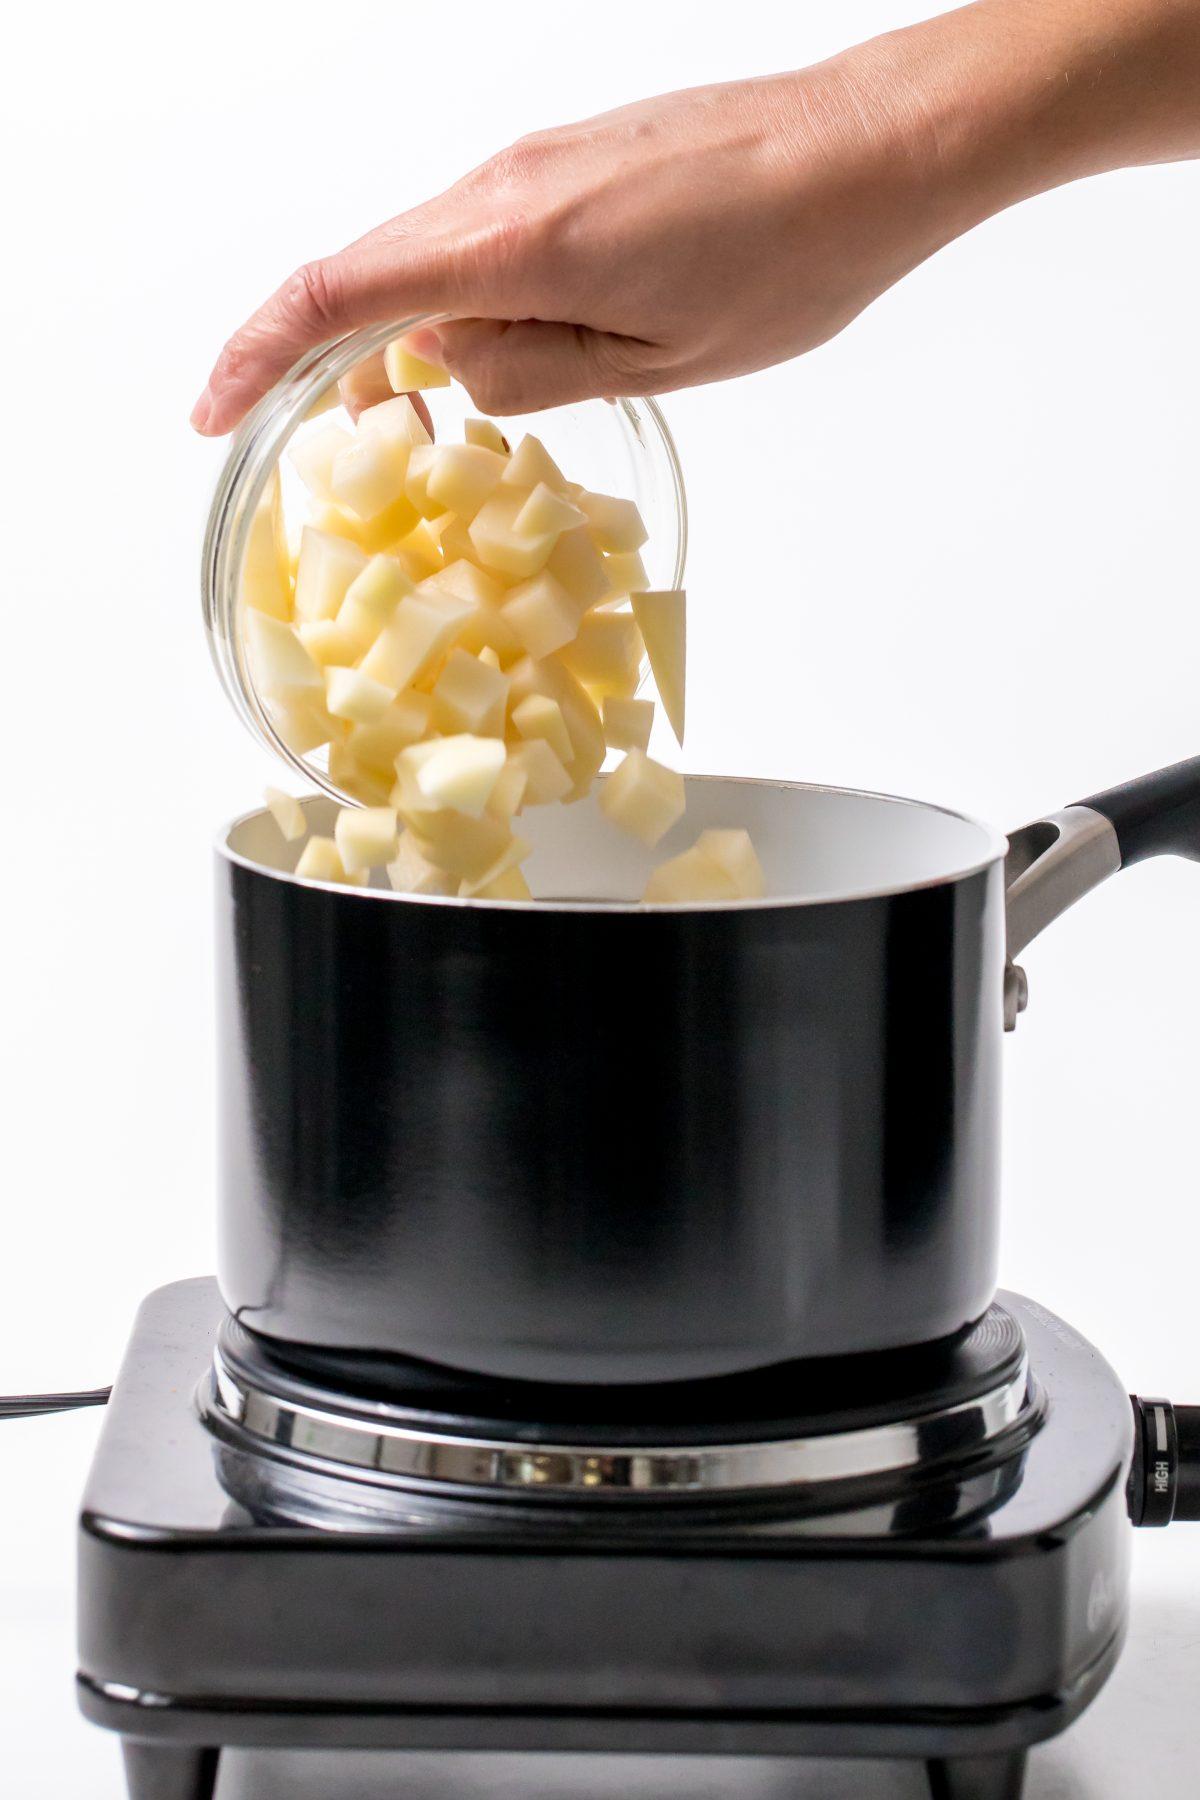 5D4B9241 - Vegan sundried tomato Parmesan knots - Steam the diced potatoes